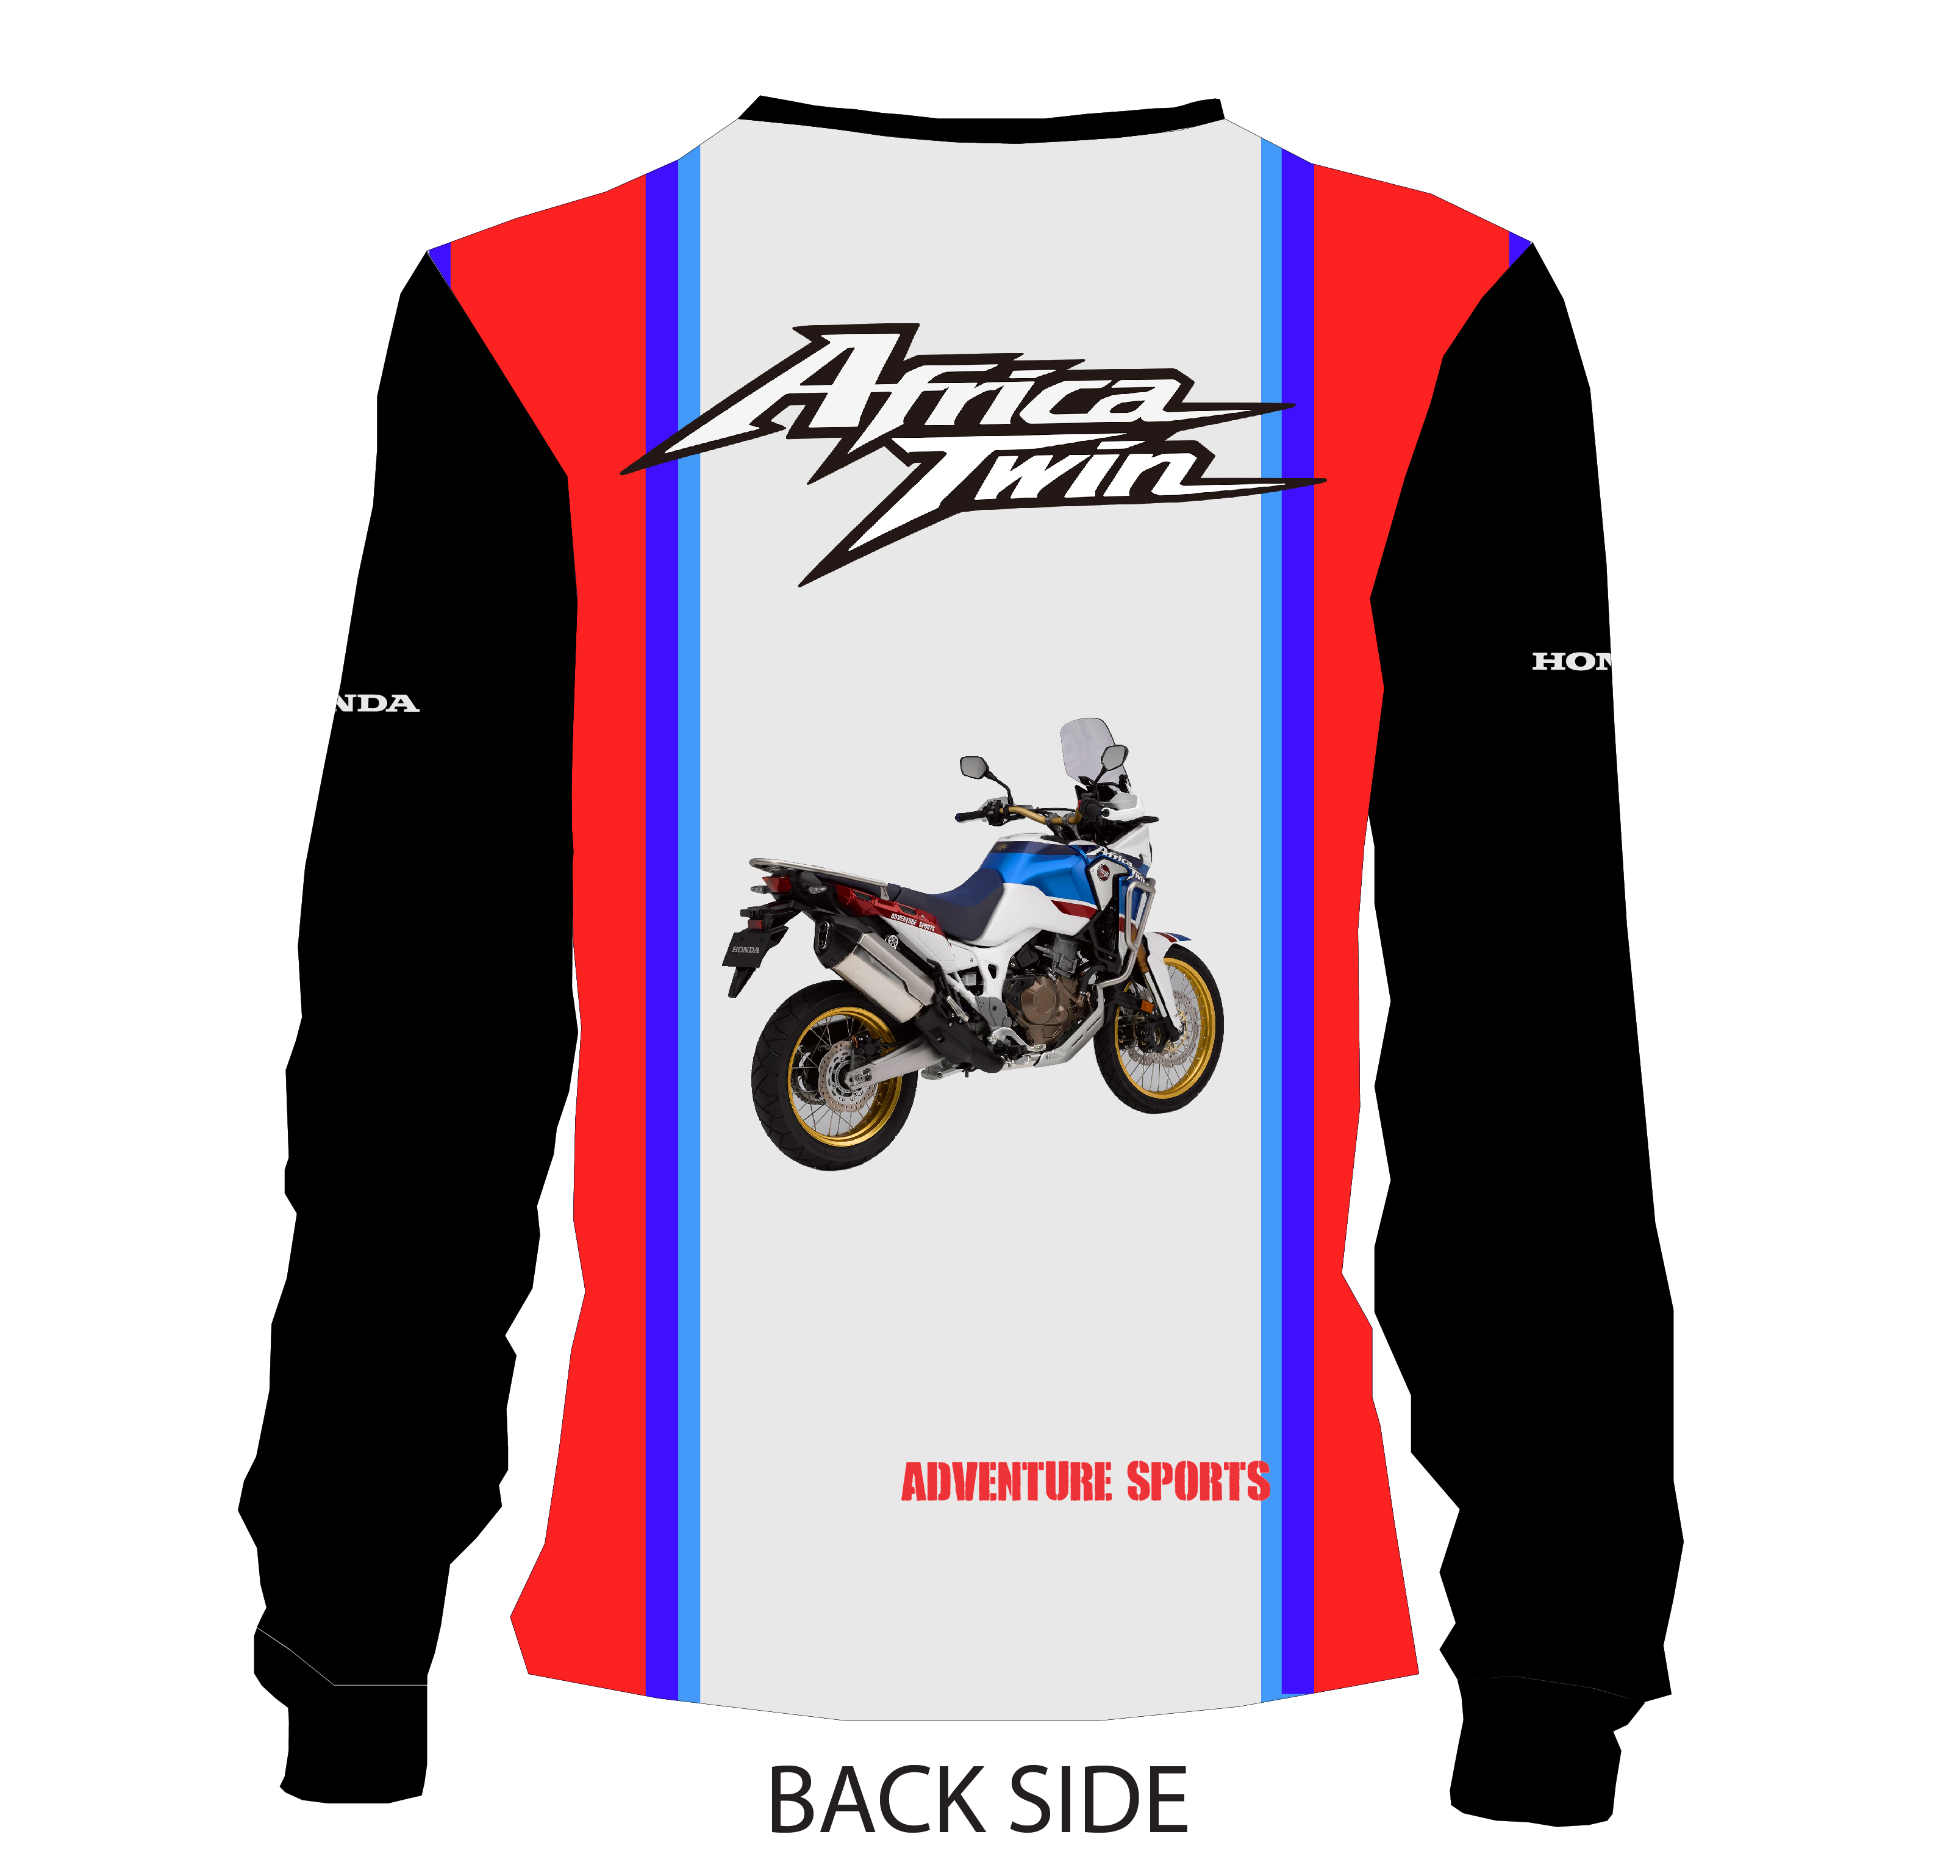 Honda CRF 1000L Africa Twin long sleeves sweatshirt